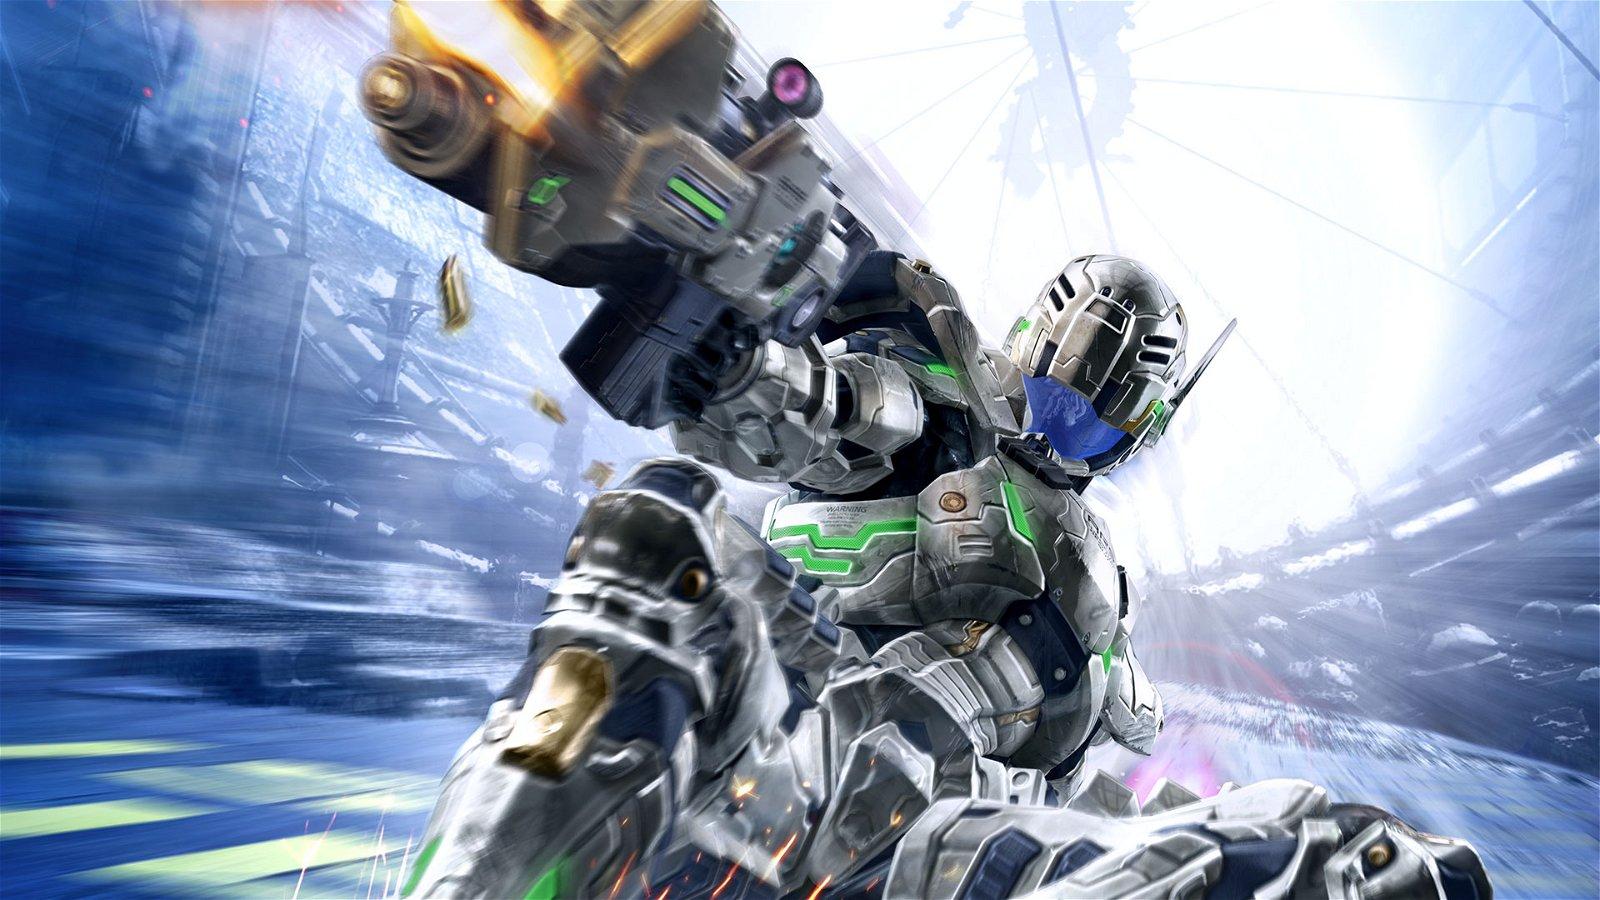 Vanquish Review - Fast Fast Blasts 4